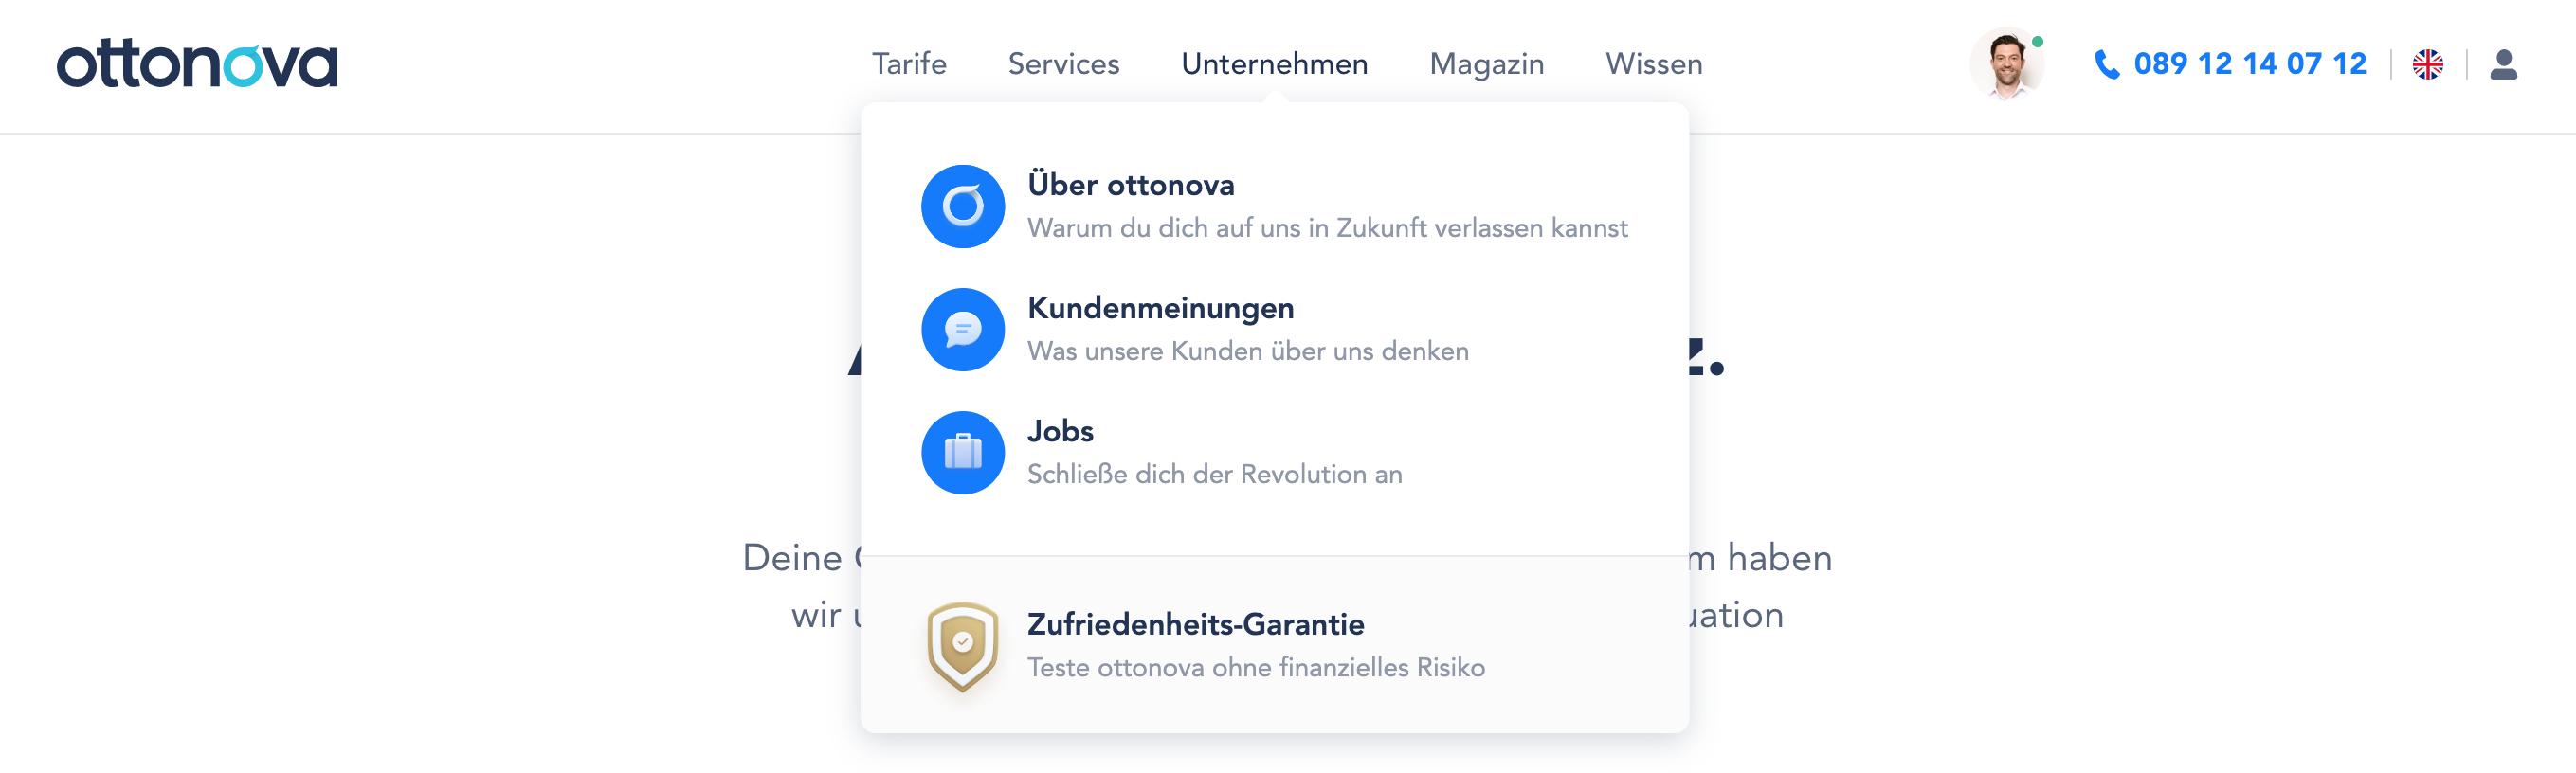 Vereinfachte Navigation durch Icons bei Ottonova